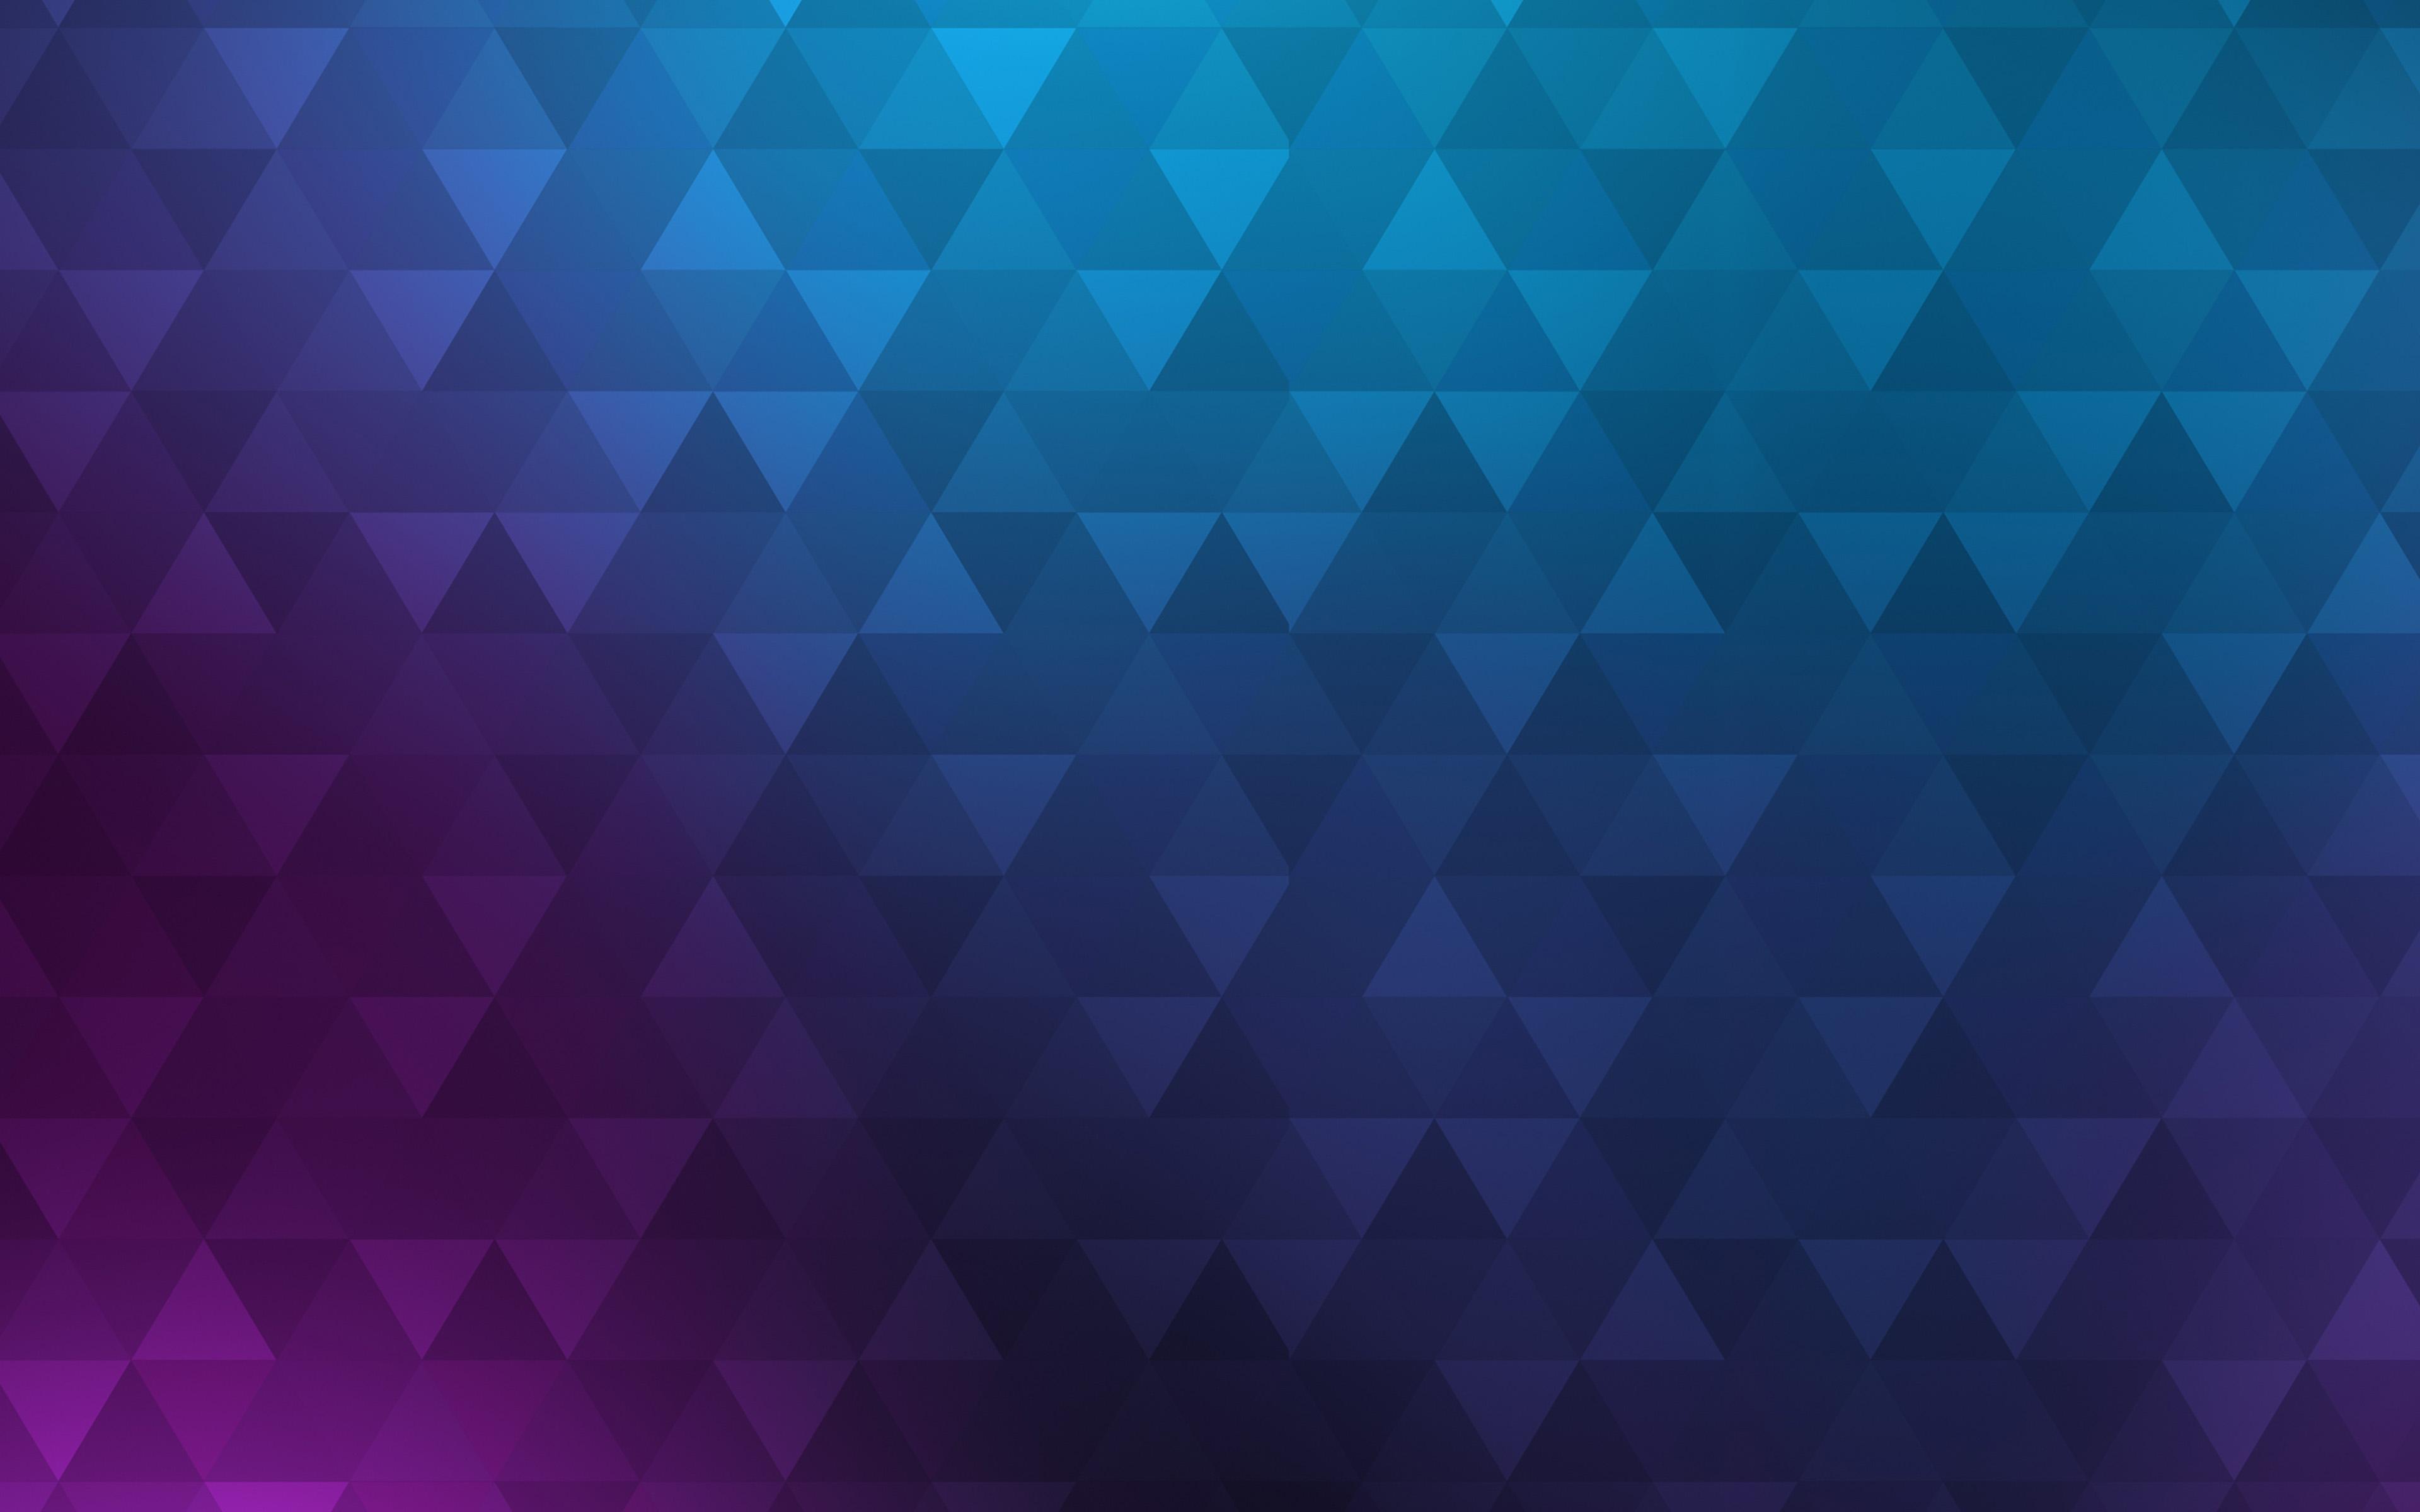 Wallpaper For Desktop Laptop Vm09 Poly Blue Purple